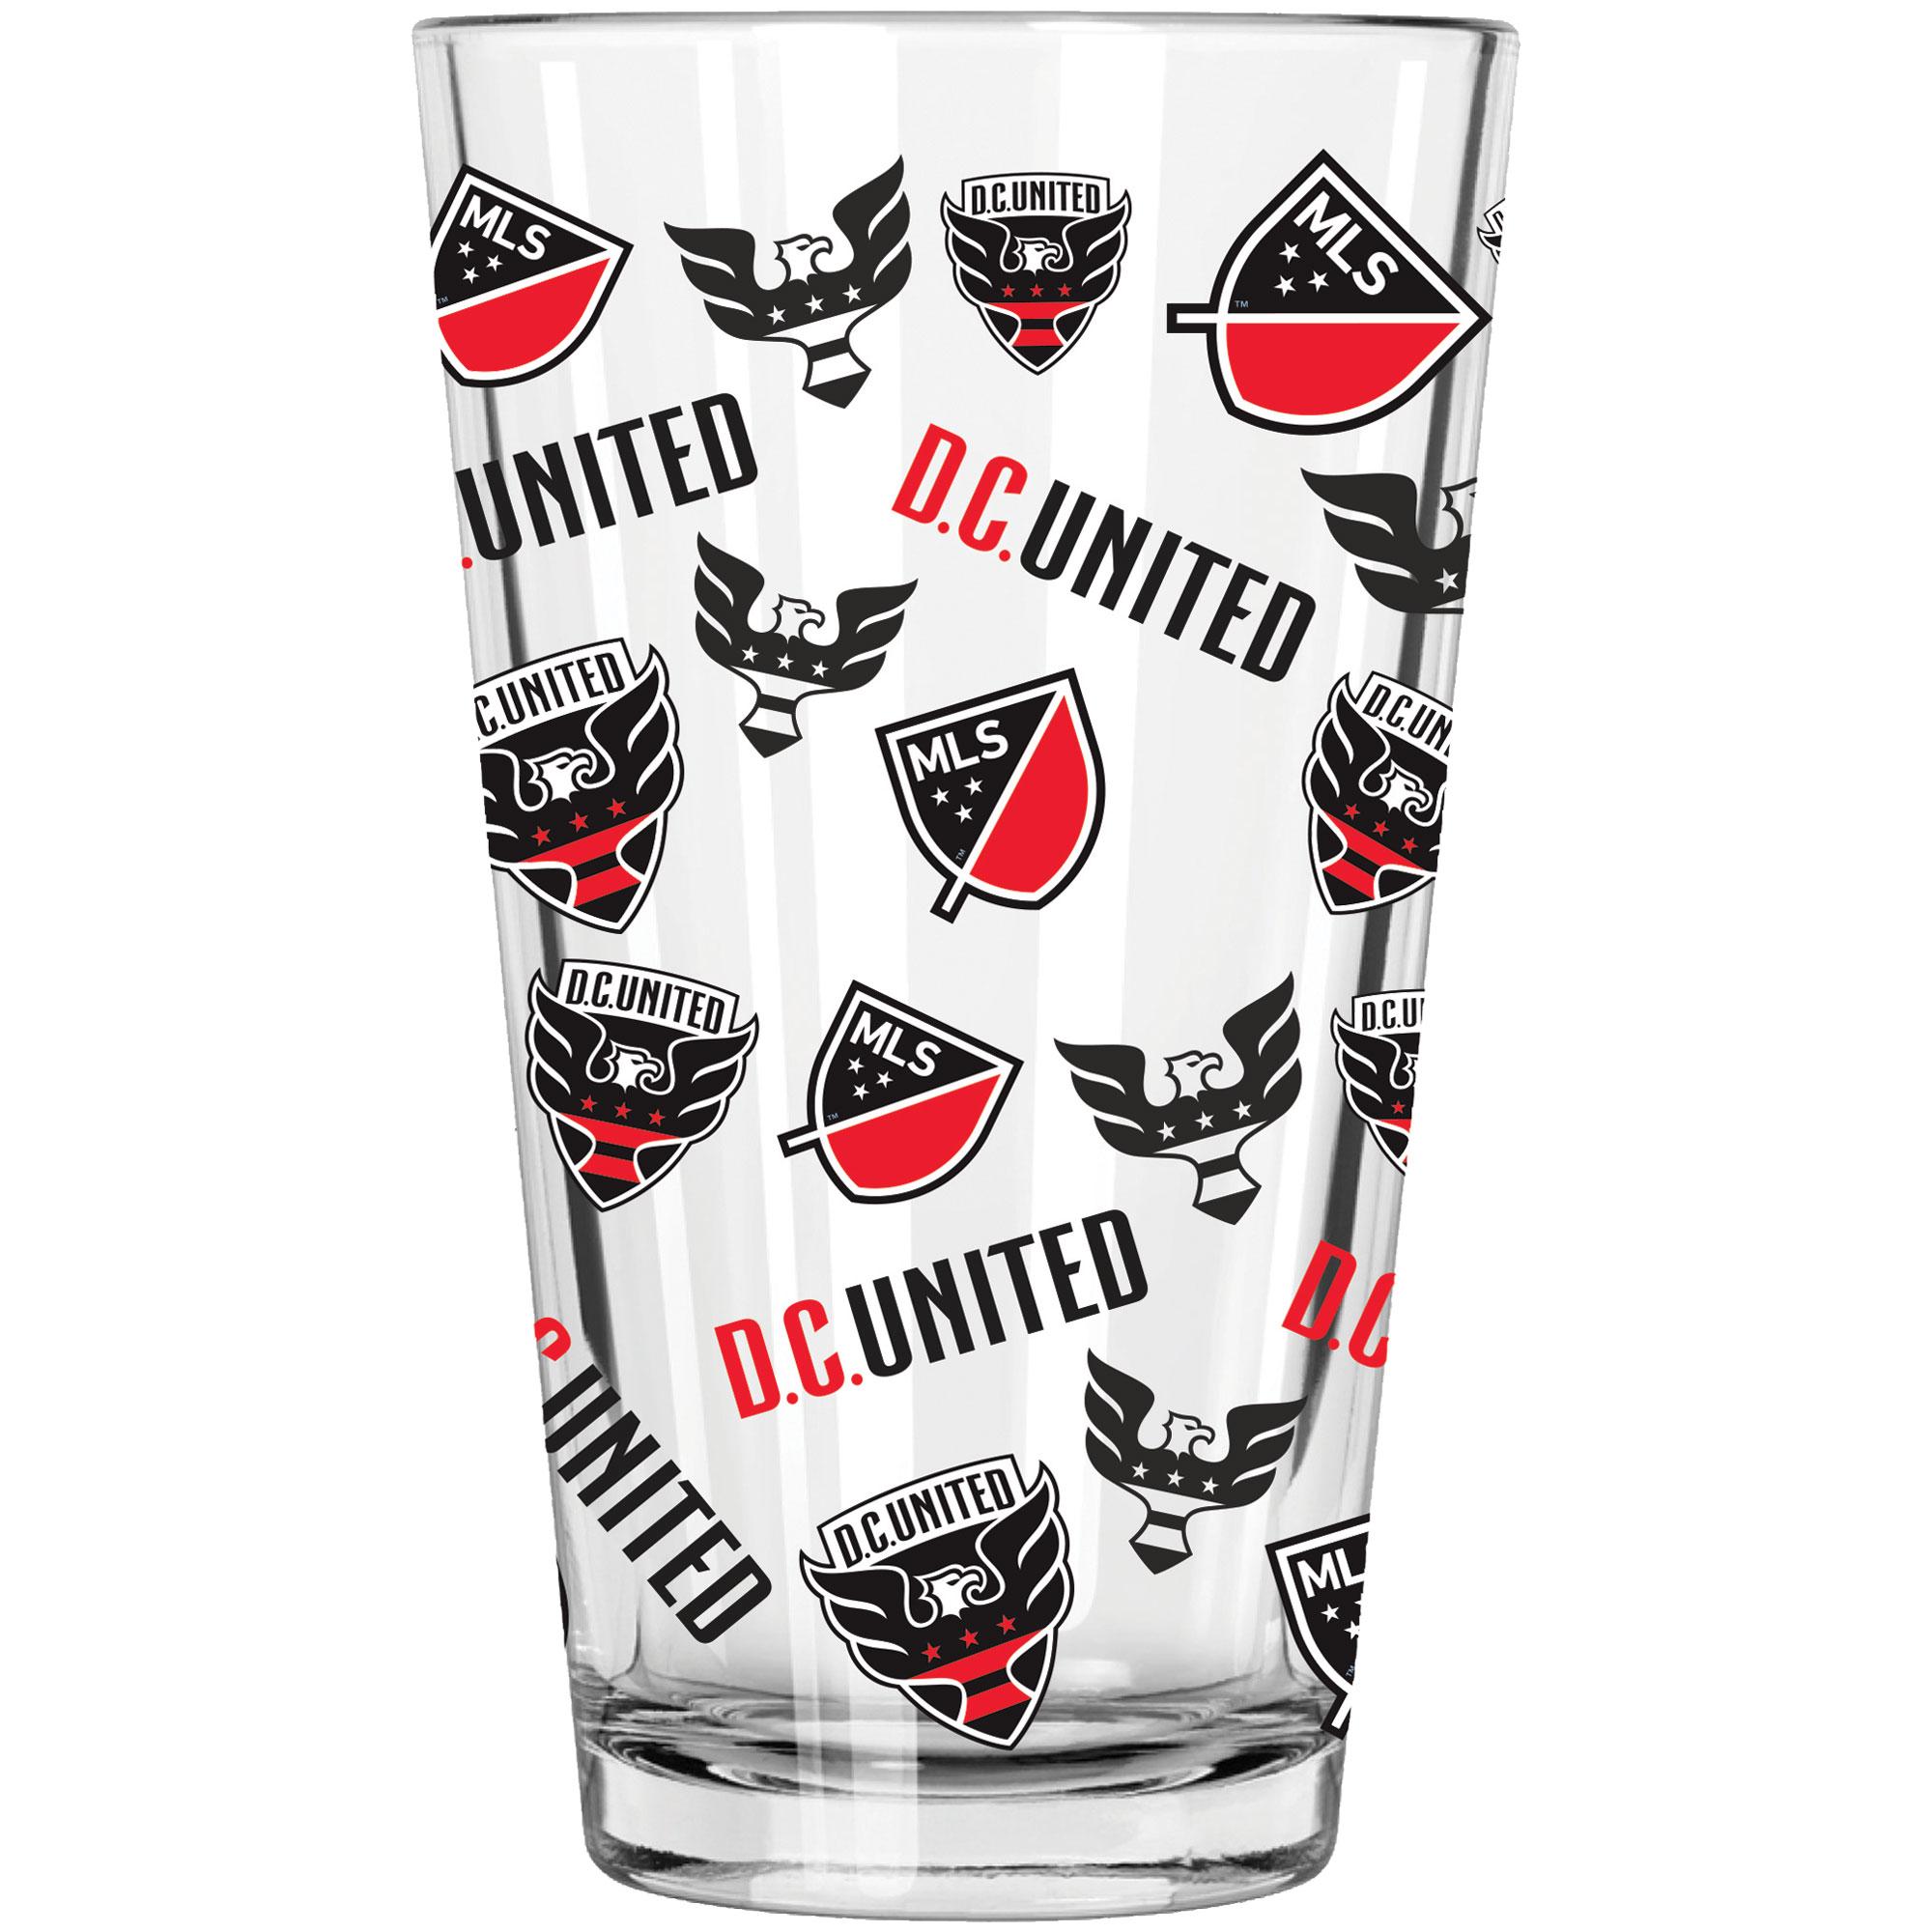 D.C. United 16oz. Full Wrap Pint Glass - No Size